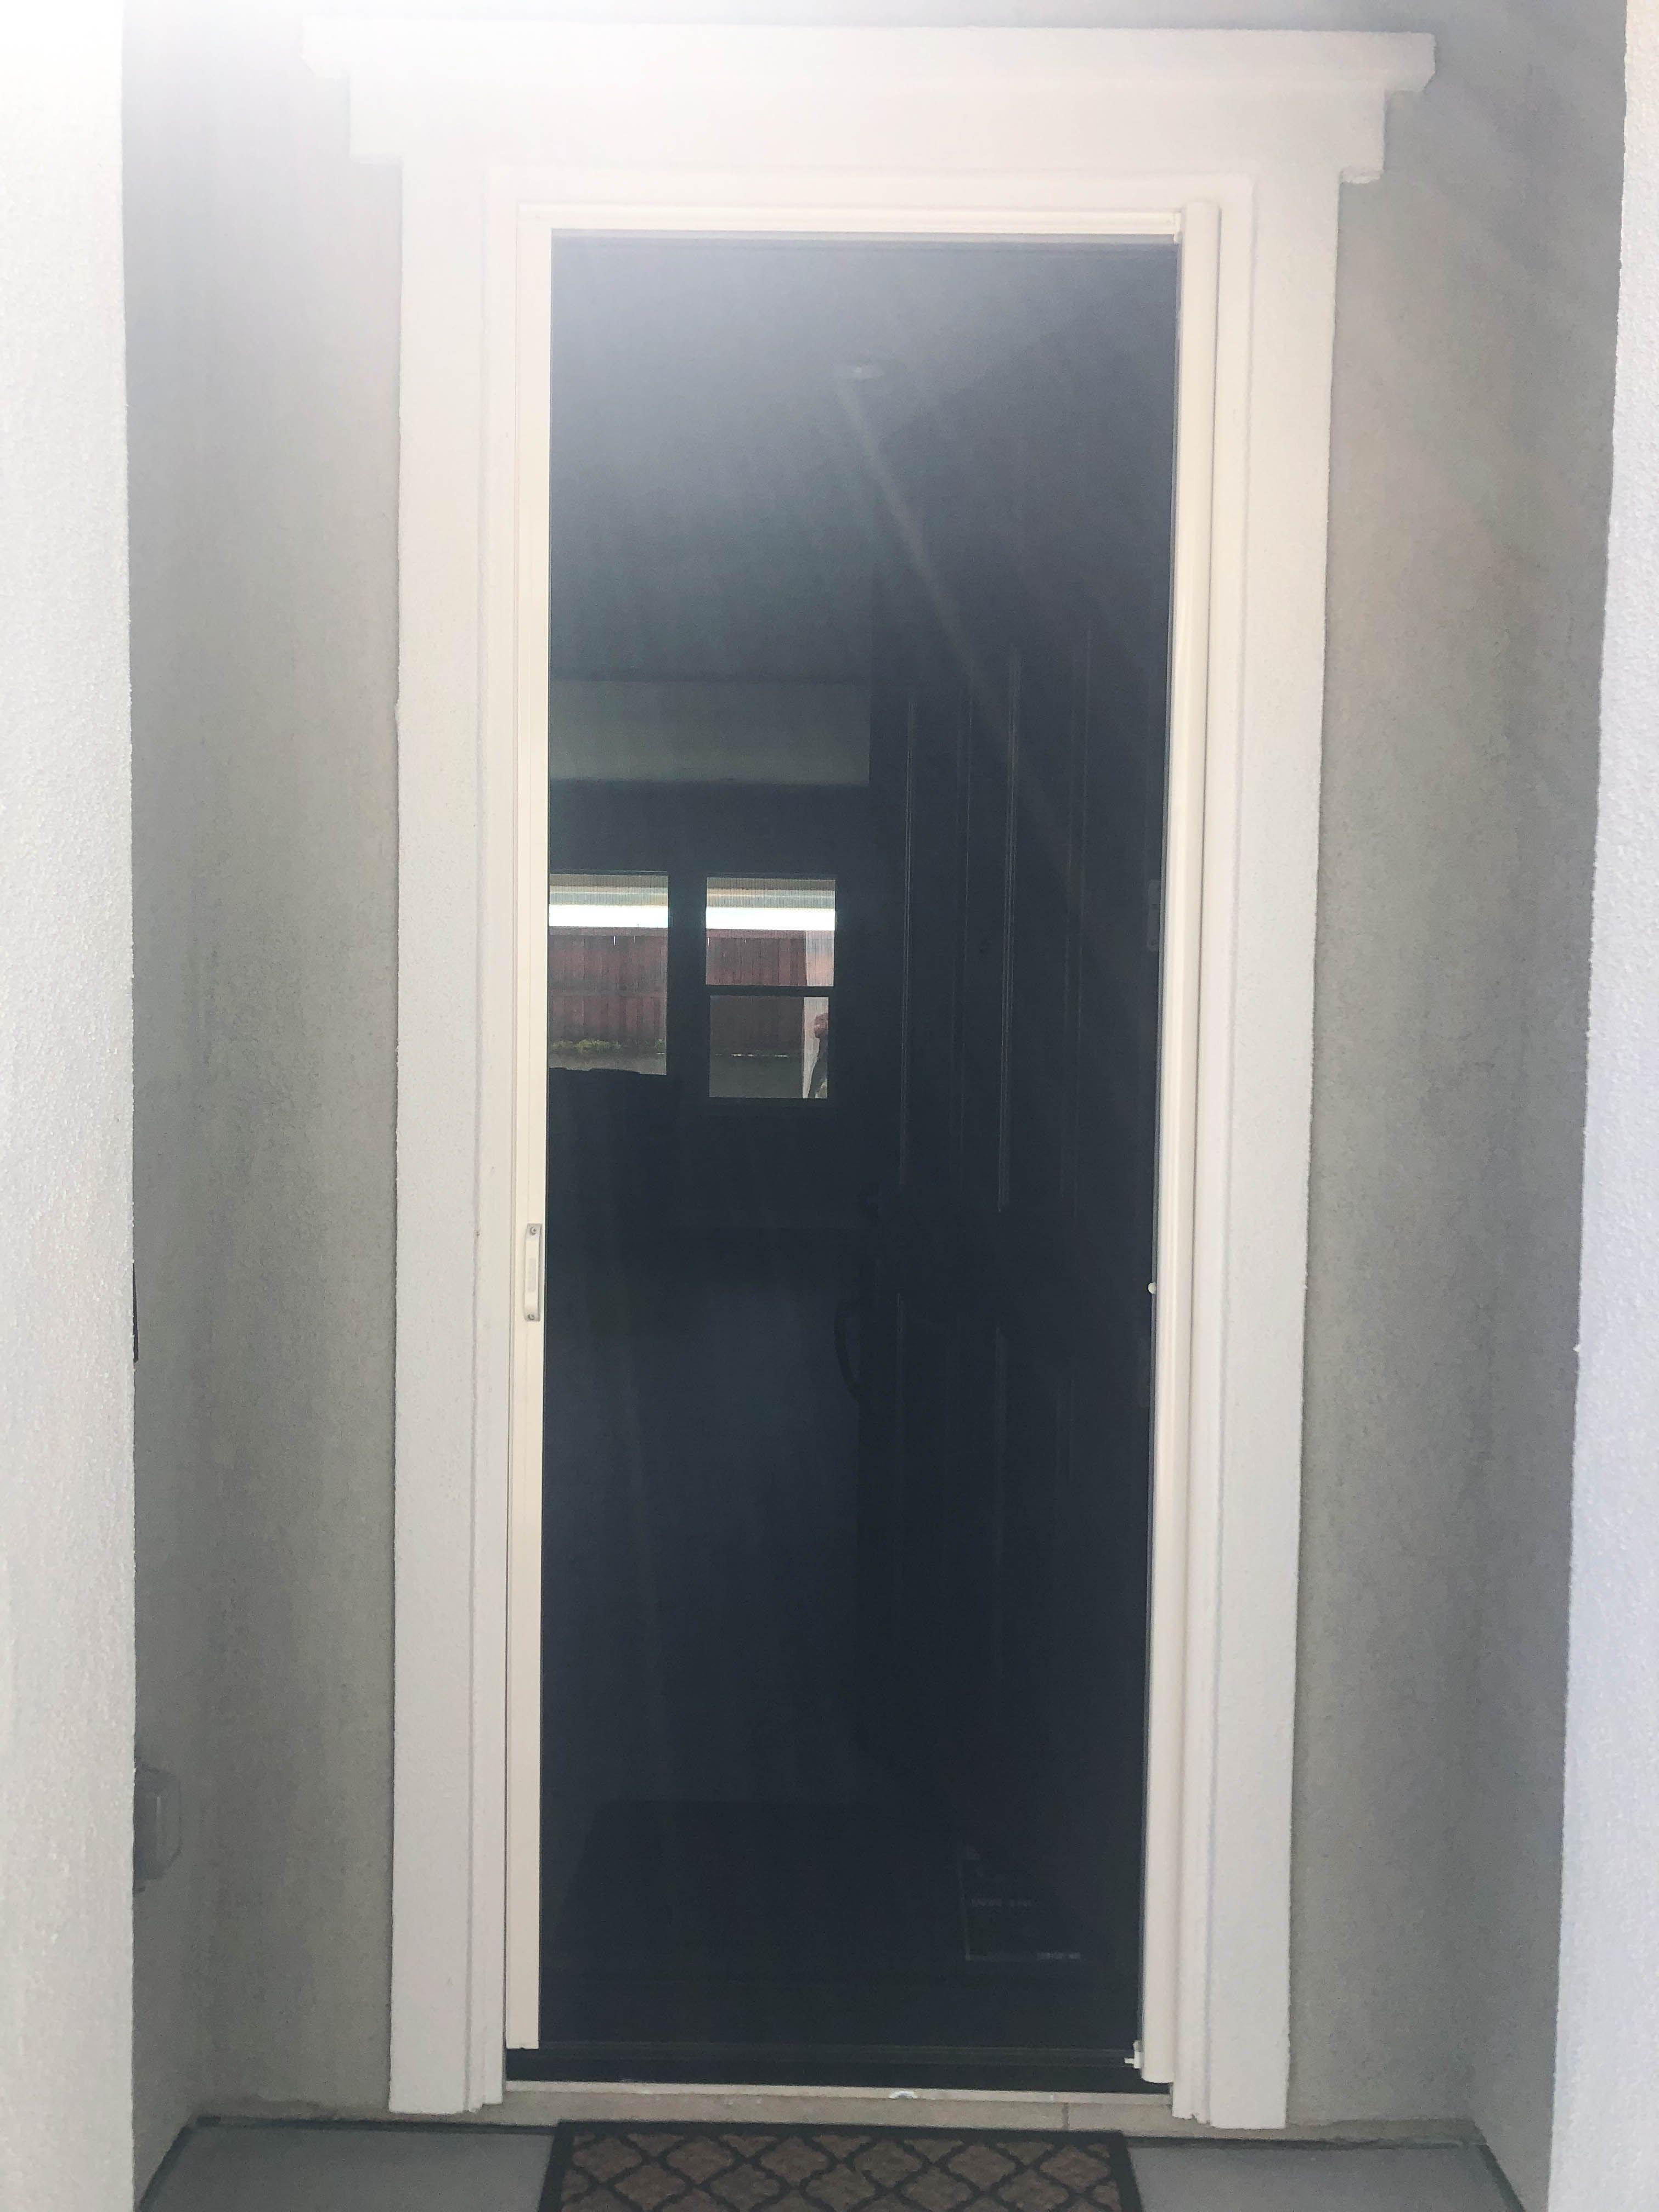 We installed two whiteframed, singledoor StowAway